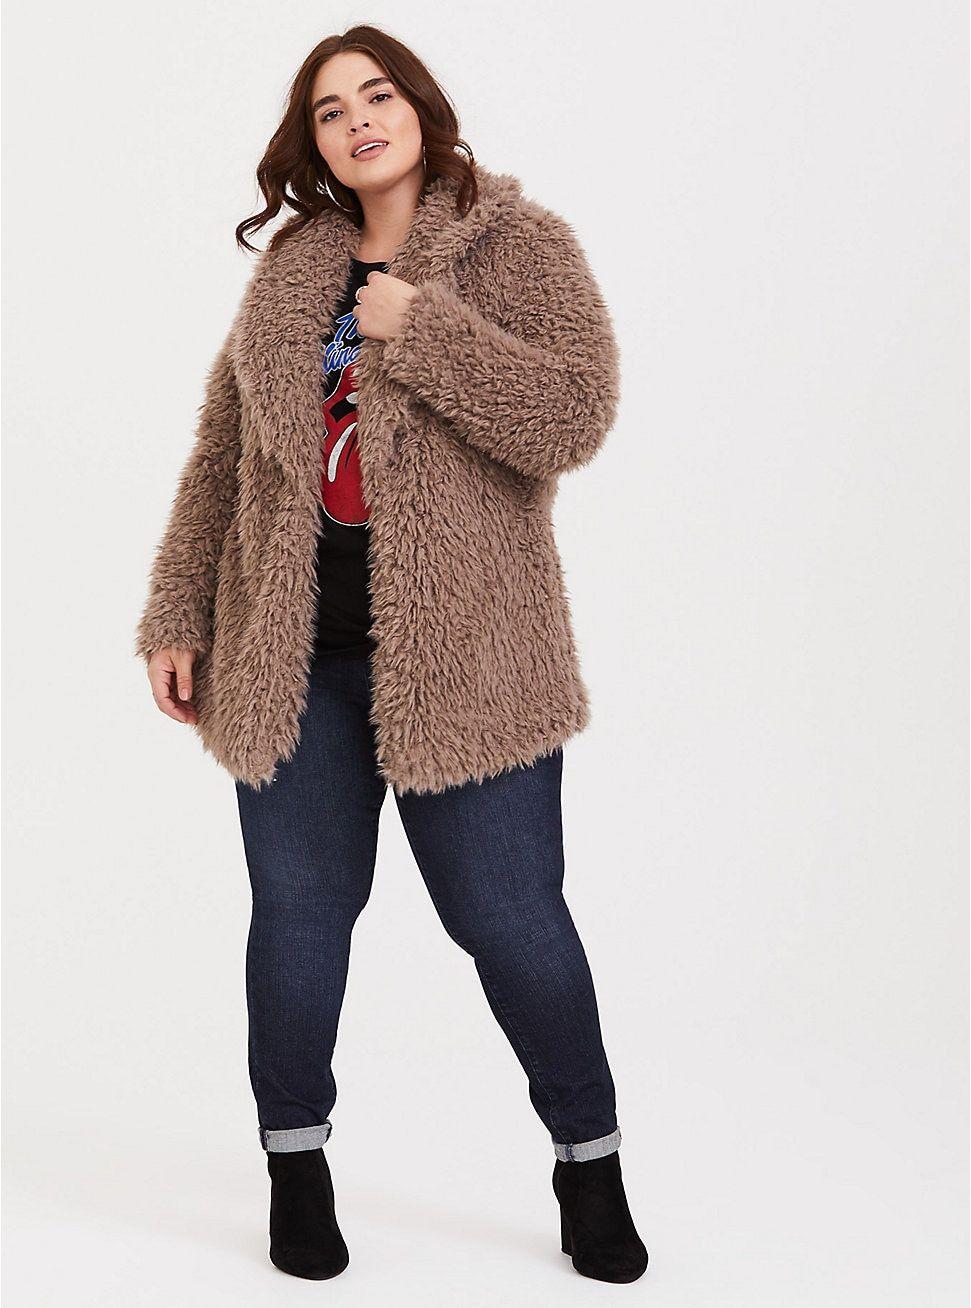 Brown Drapey Sherpa Jacket Sherpa Jacket Plus Size Coats Jackets [ 1308 x 971 Pixel ]